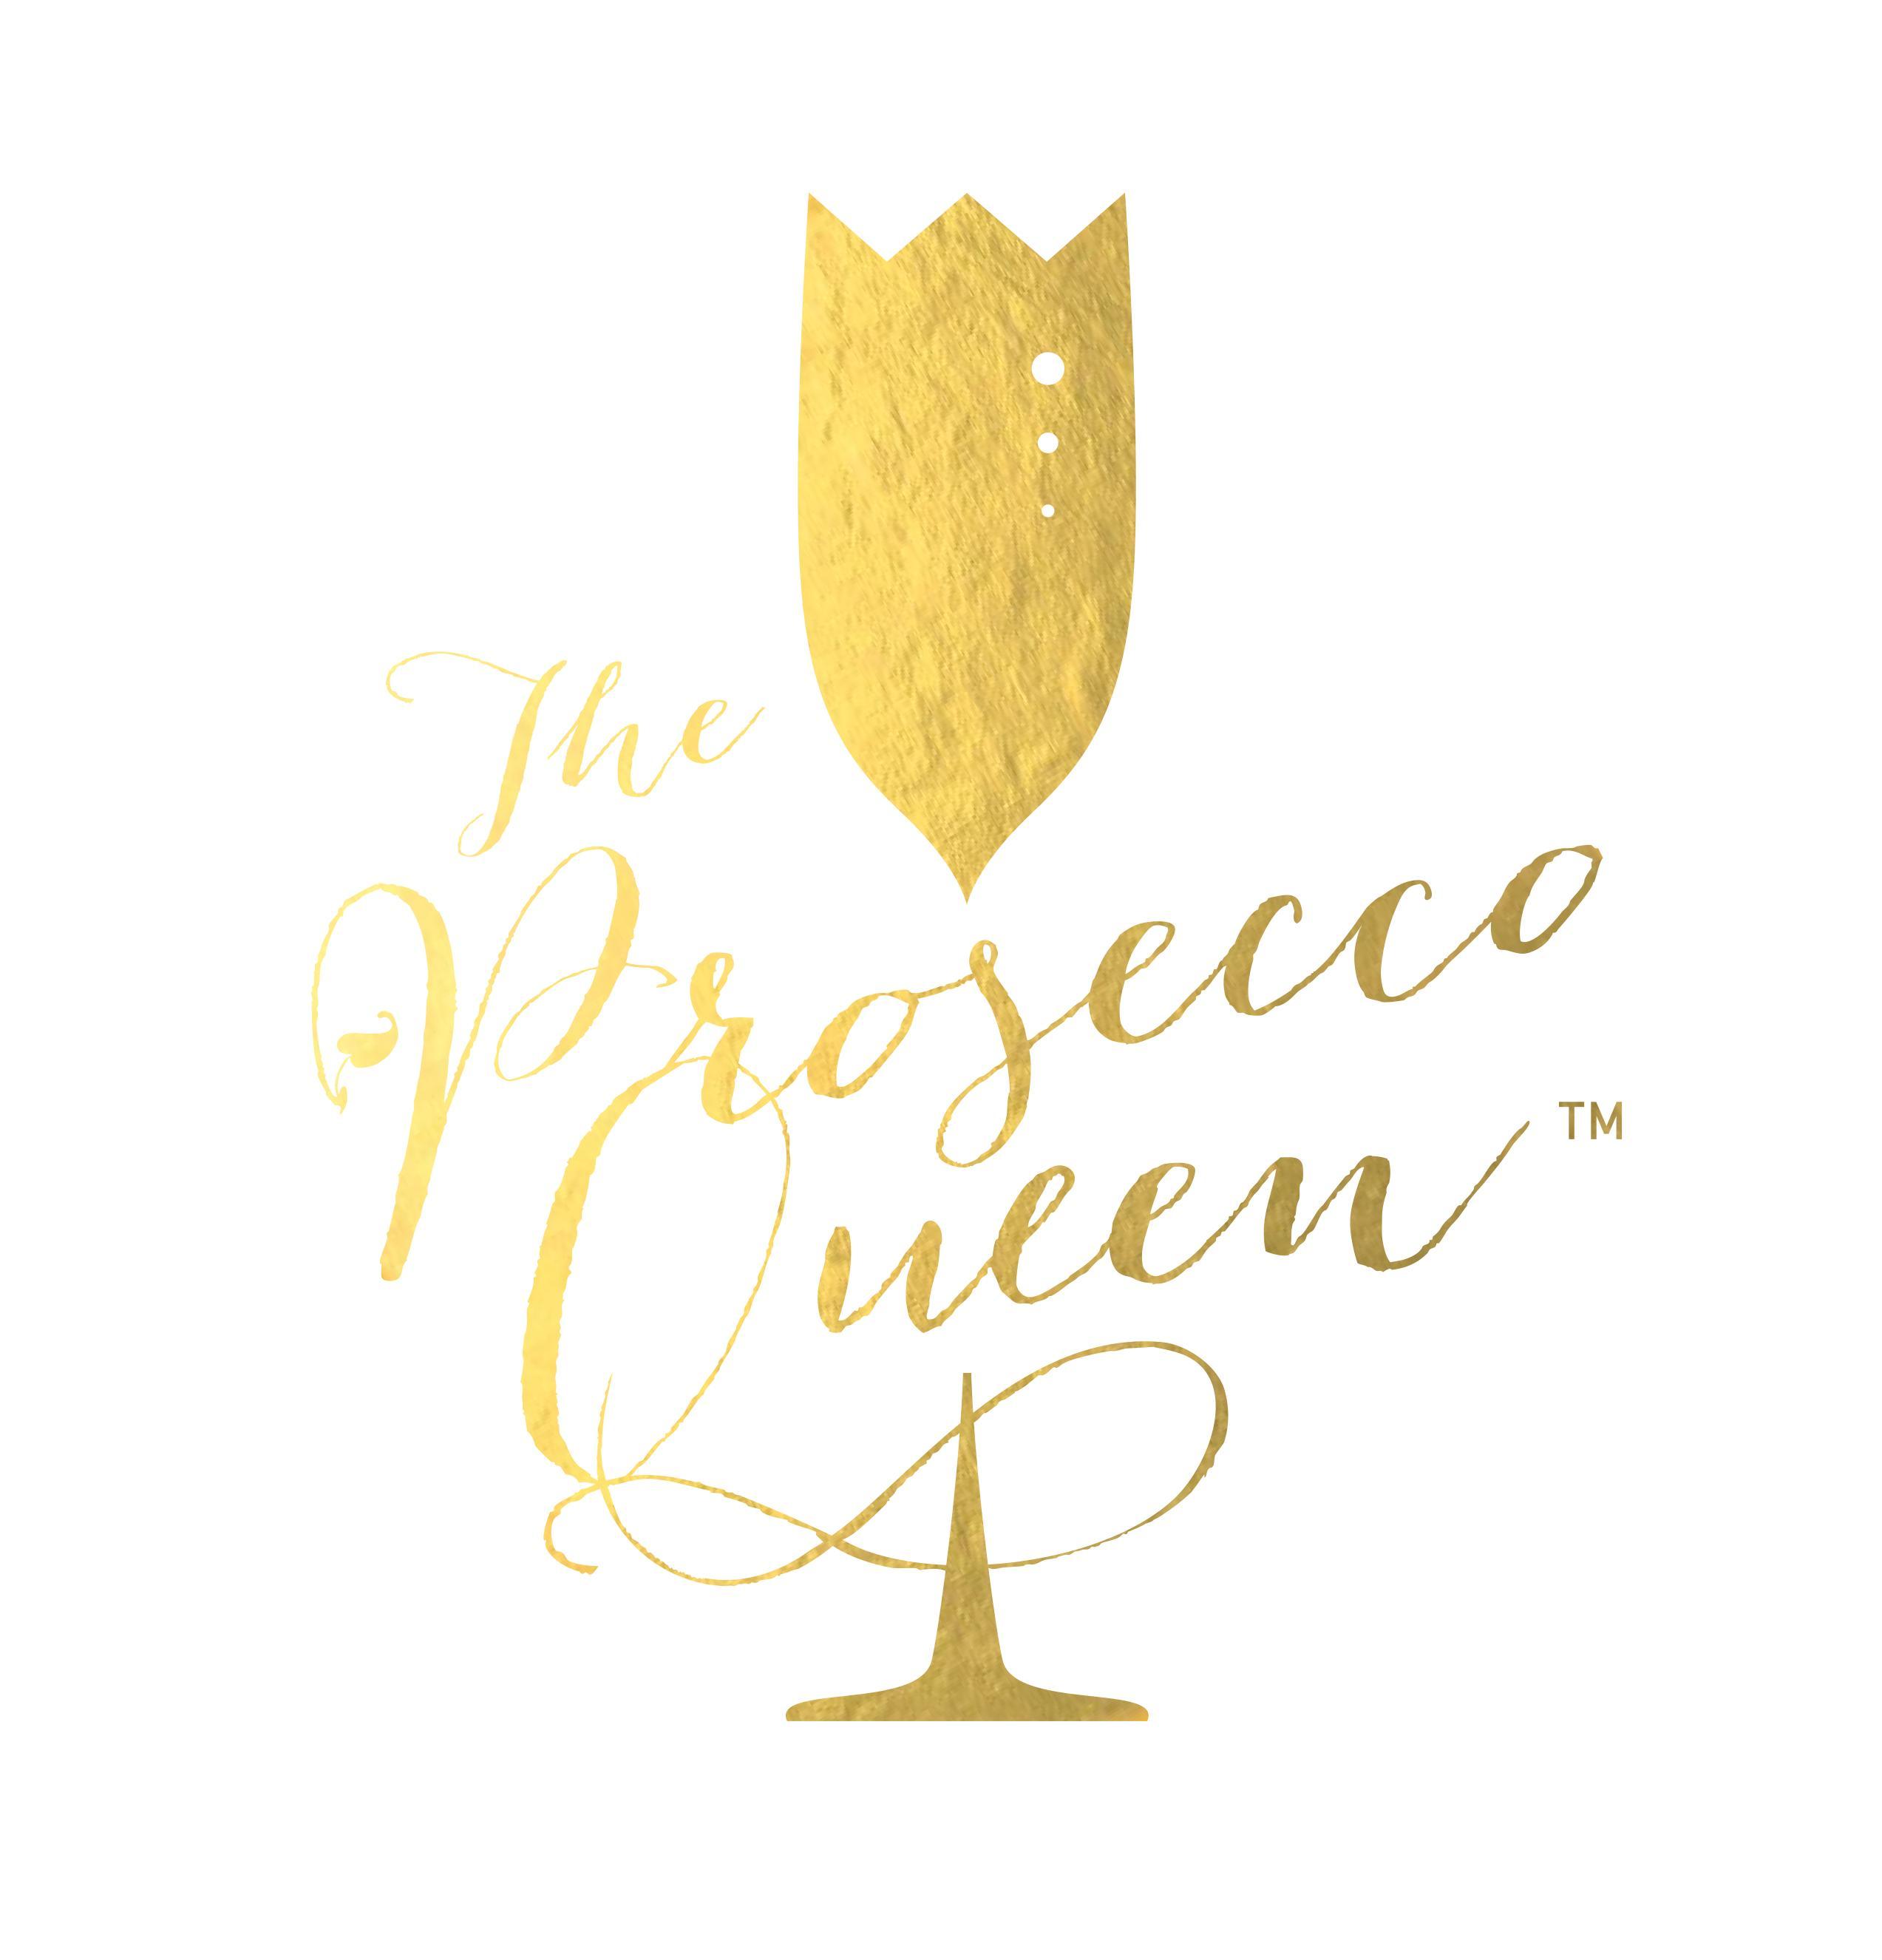 The Prosecco Queen